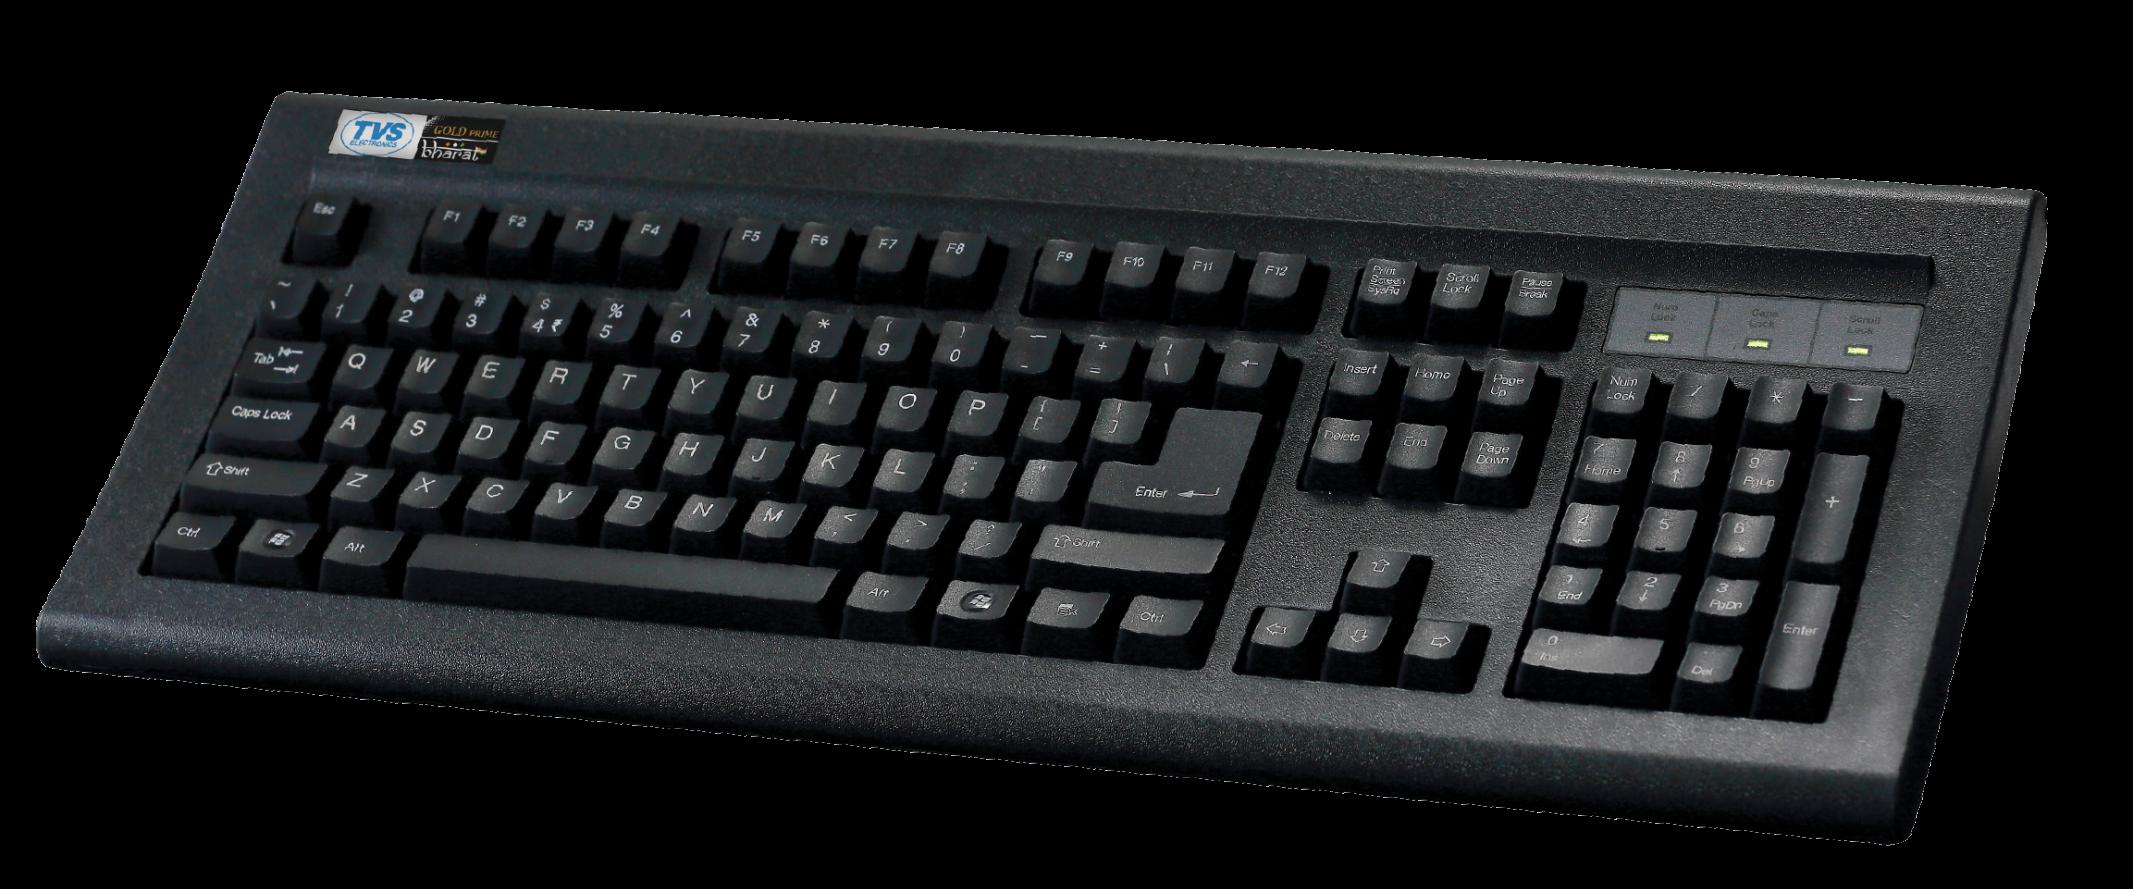 Gold Prime Keyboard